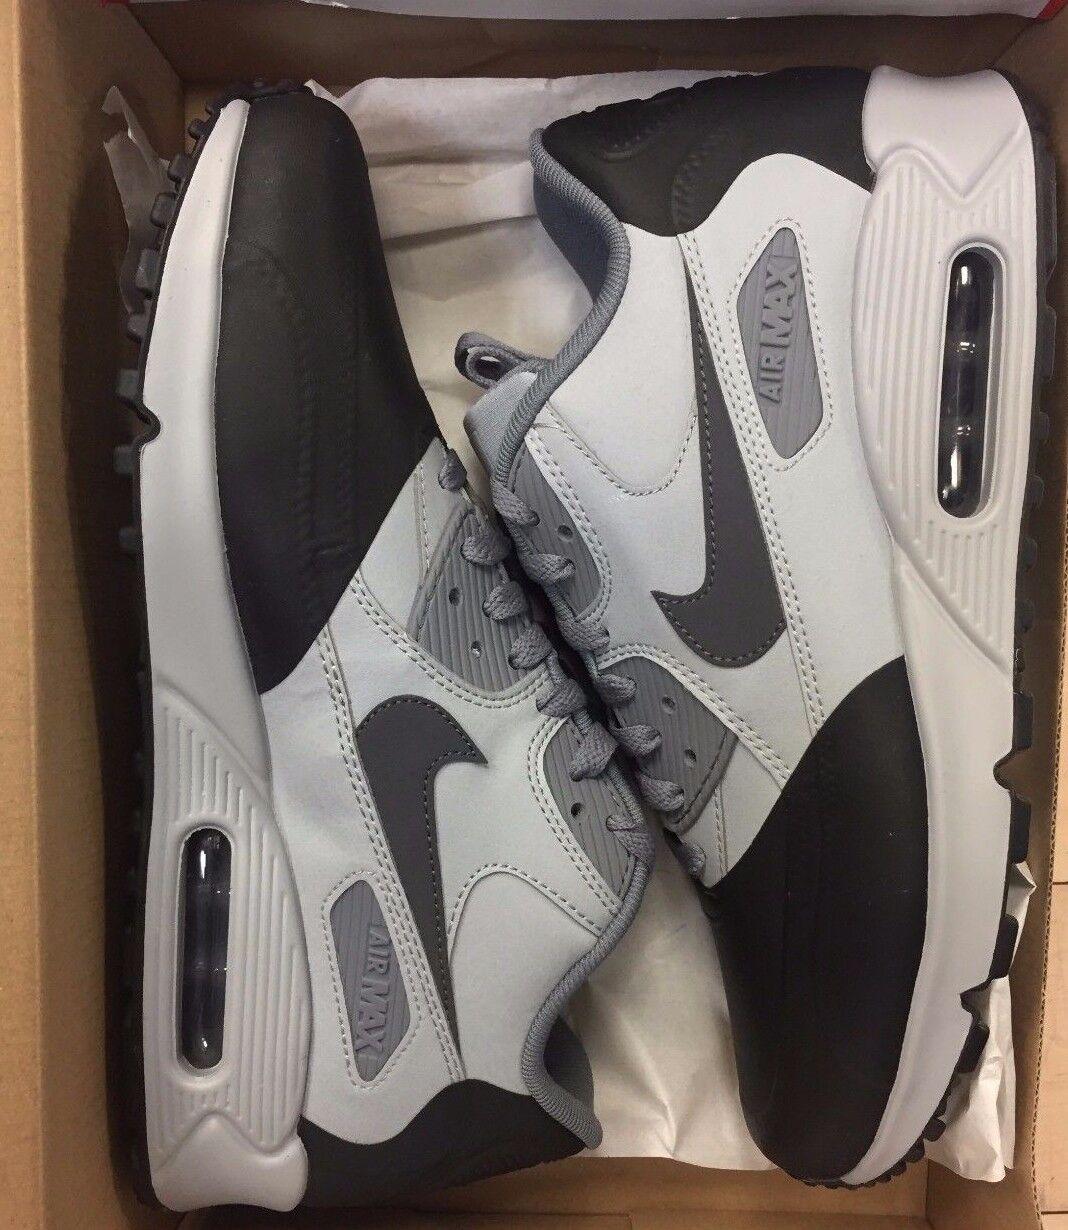 a921137d1e 60%OFF Nike Air Max 90 Premium SE Wolf Grey Anthracite 858954-001 Mens